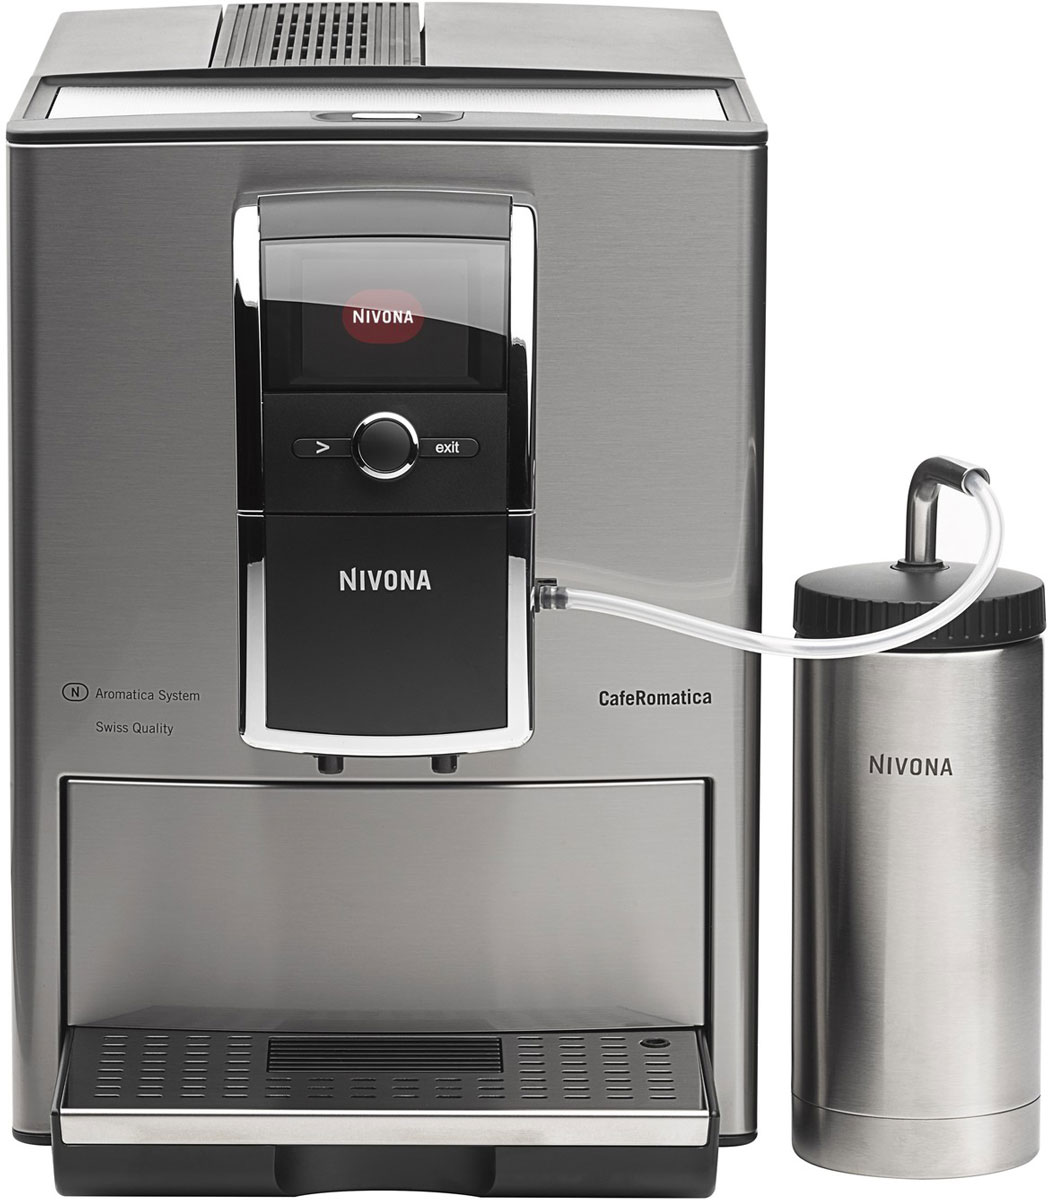 Nivona CafeRomatica NICR 858 кофемашинаТВОС-00688